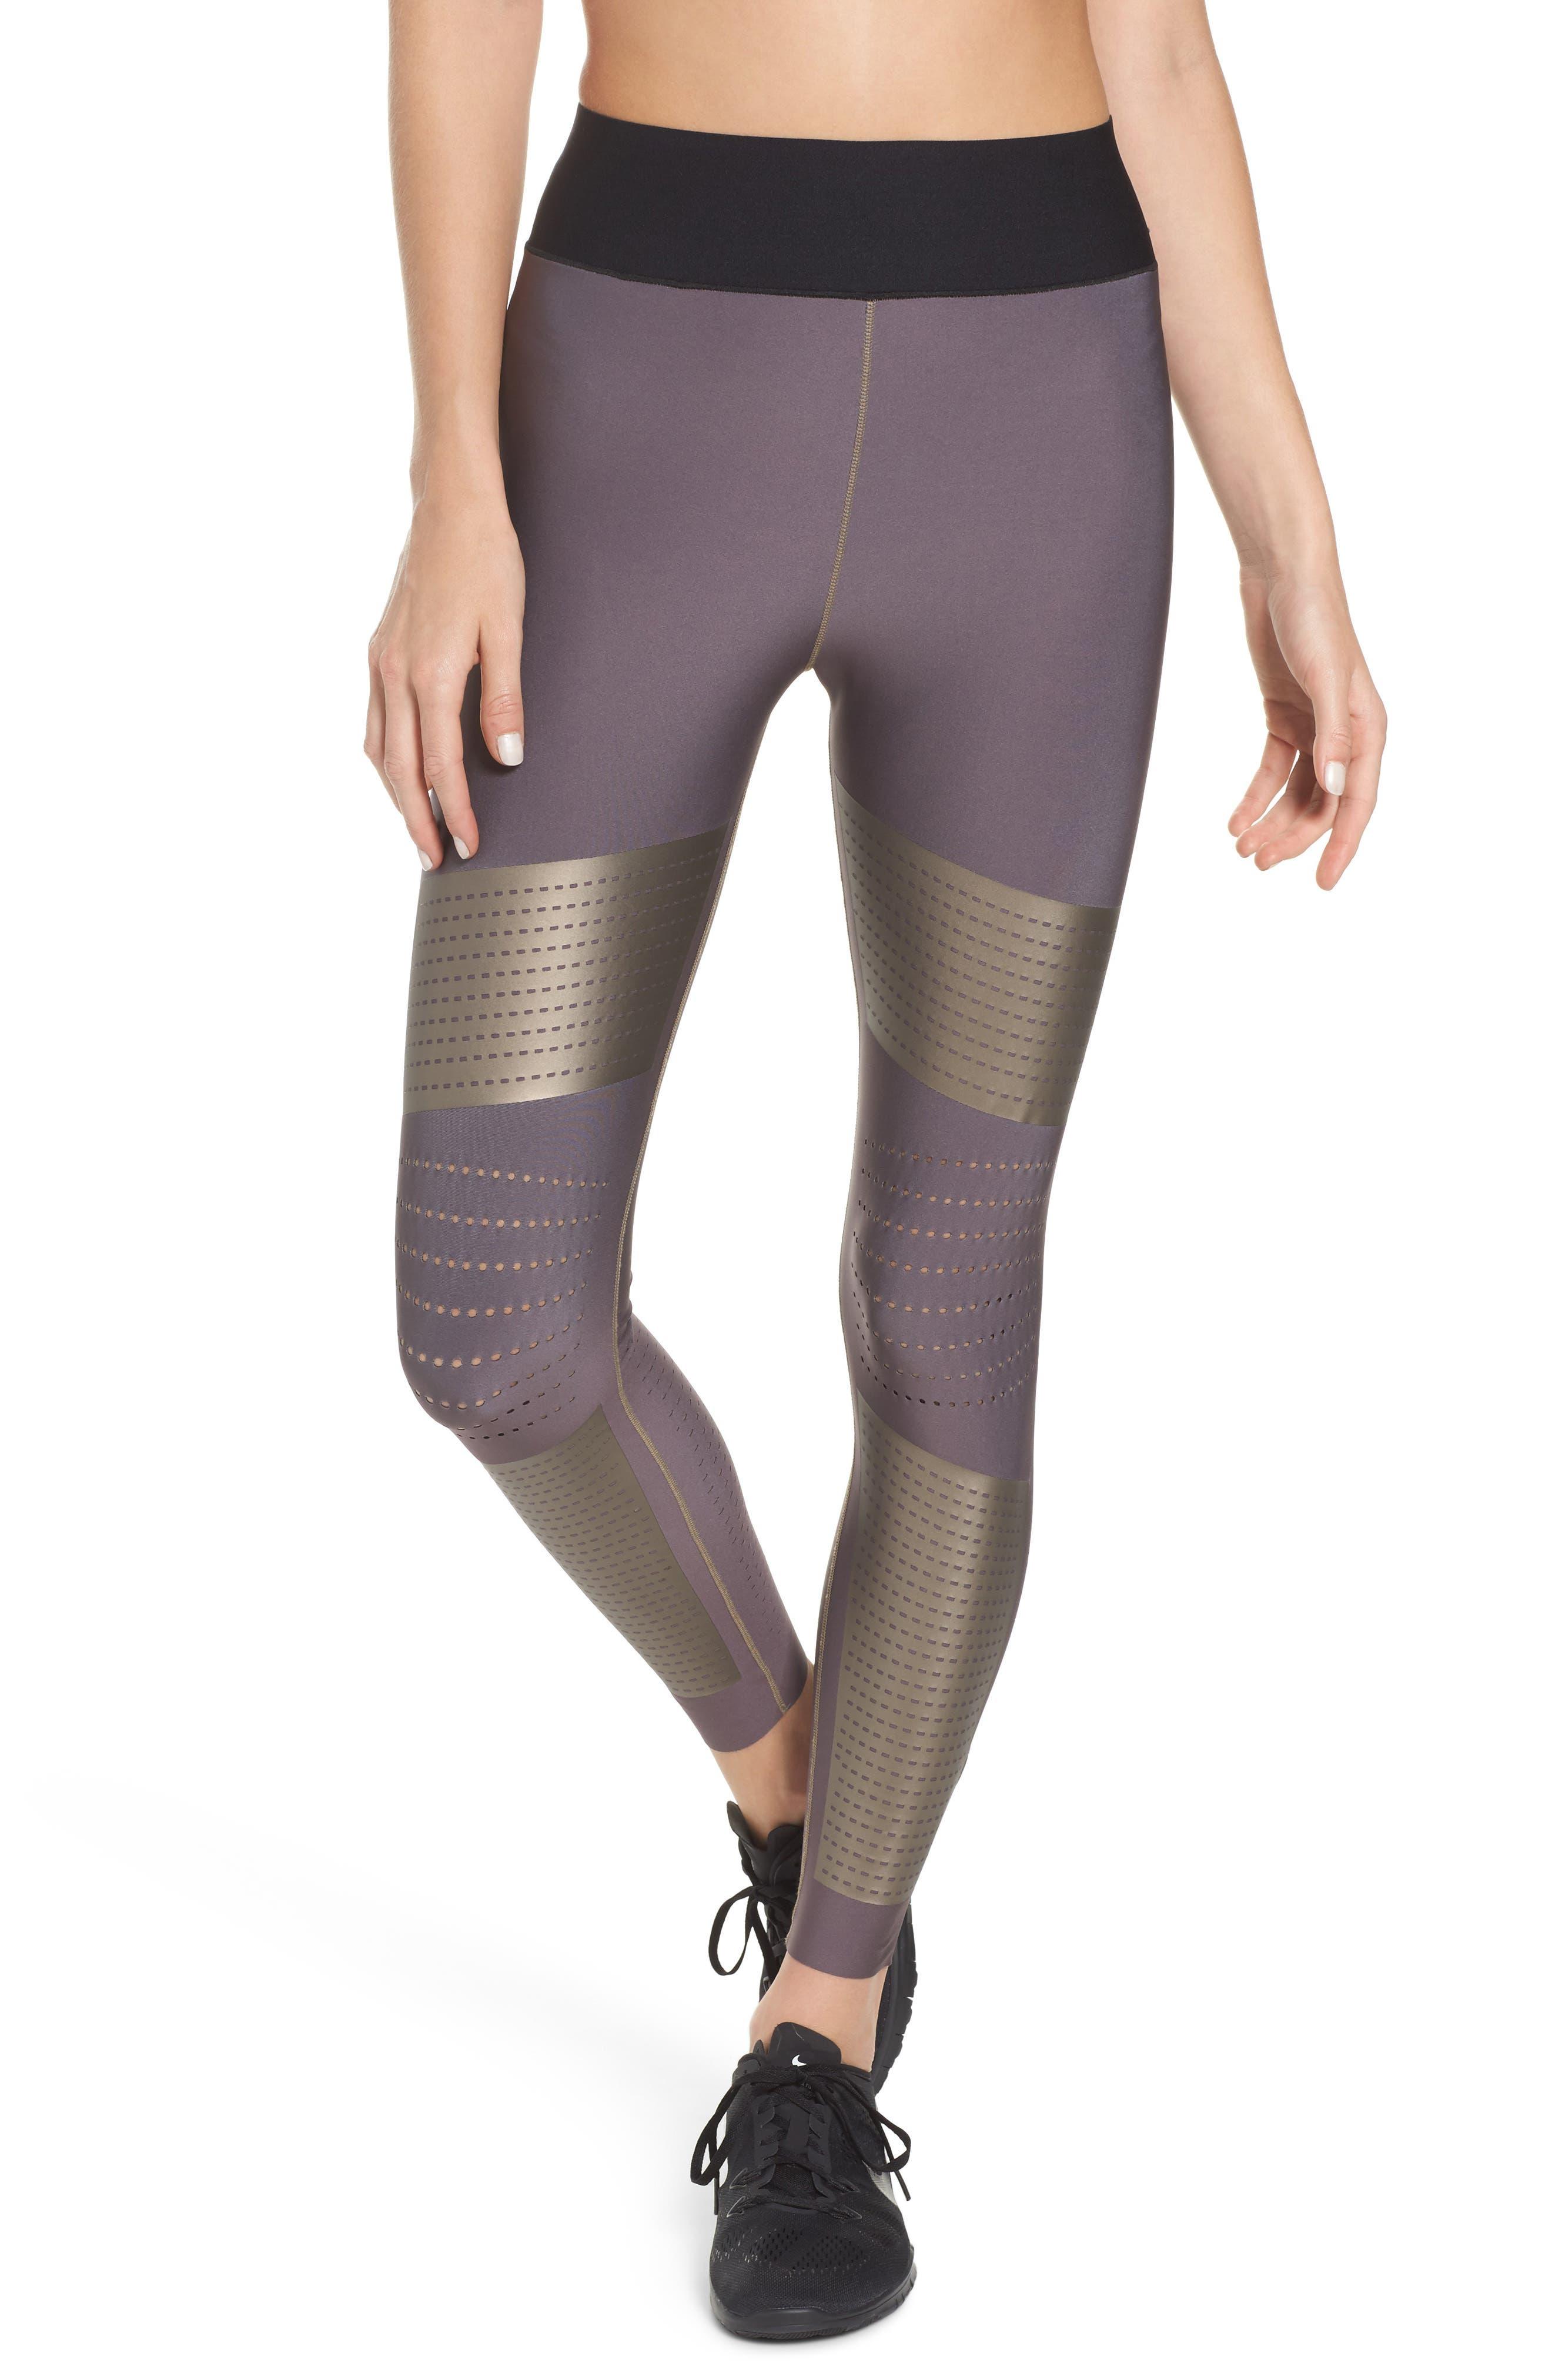 Ultra Silk AK17 High Waist Leggings,                         Main,                         color, Taupe/ Taupe Satin